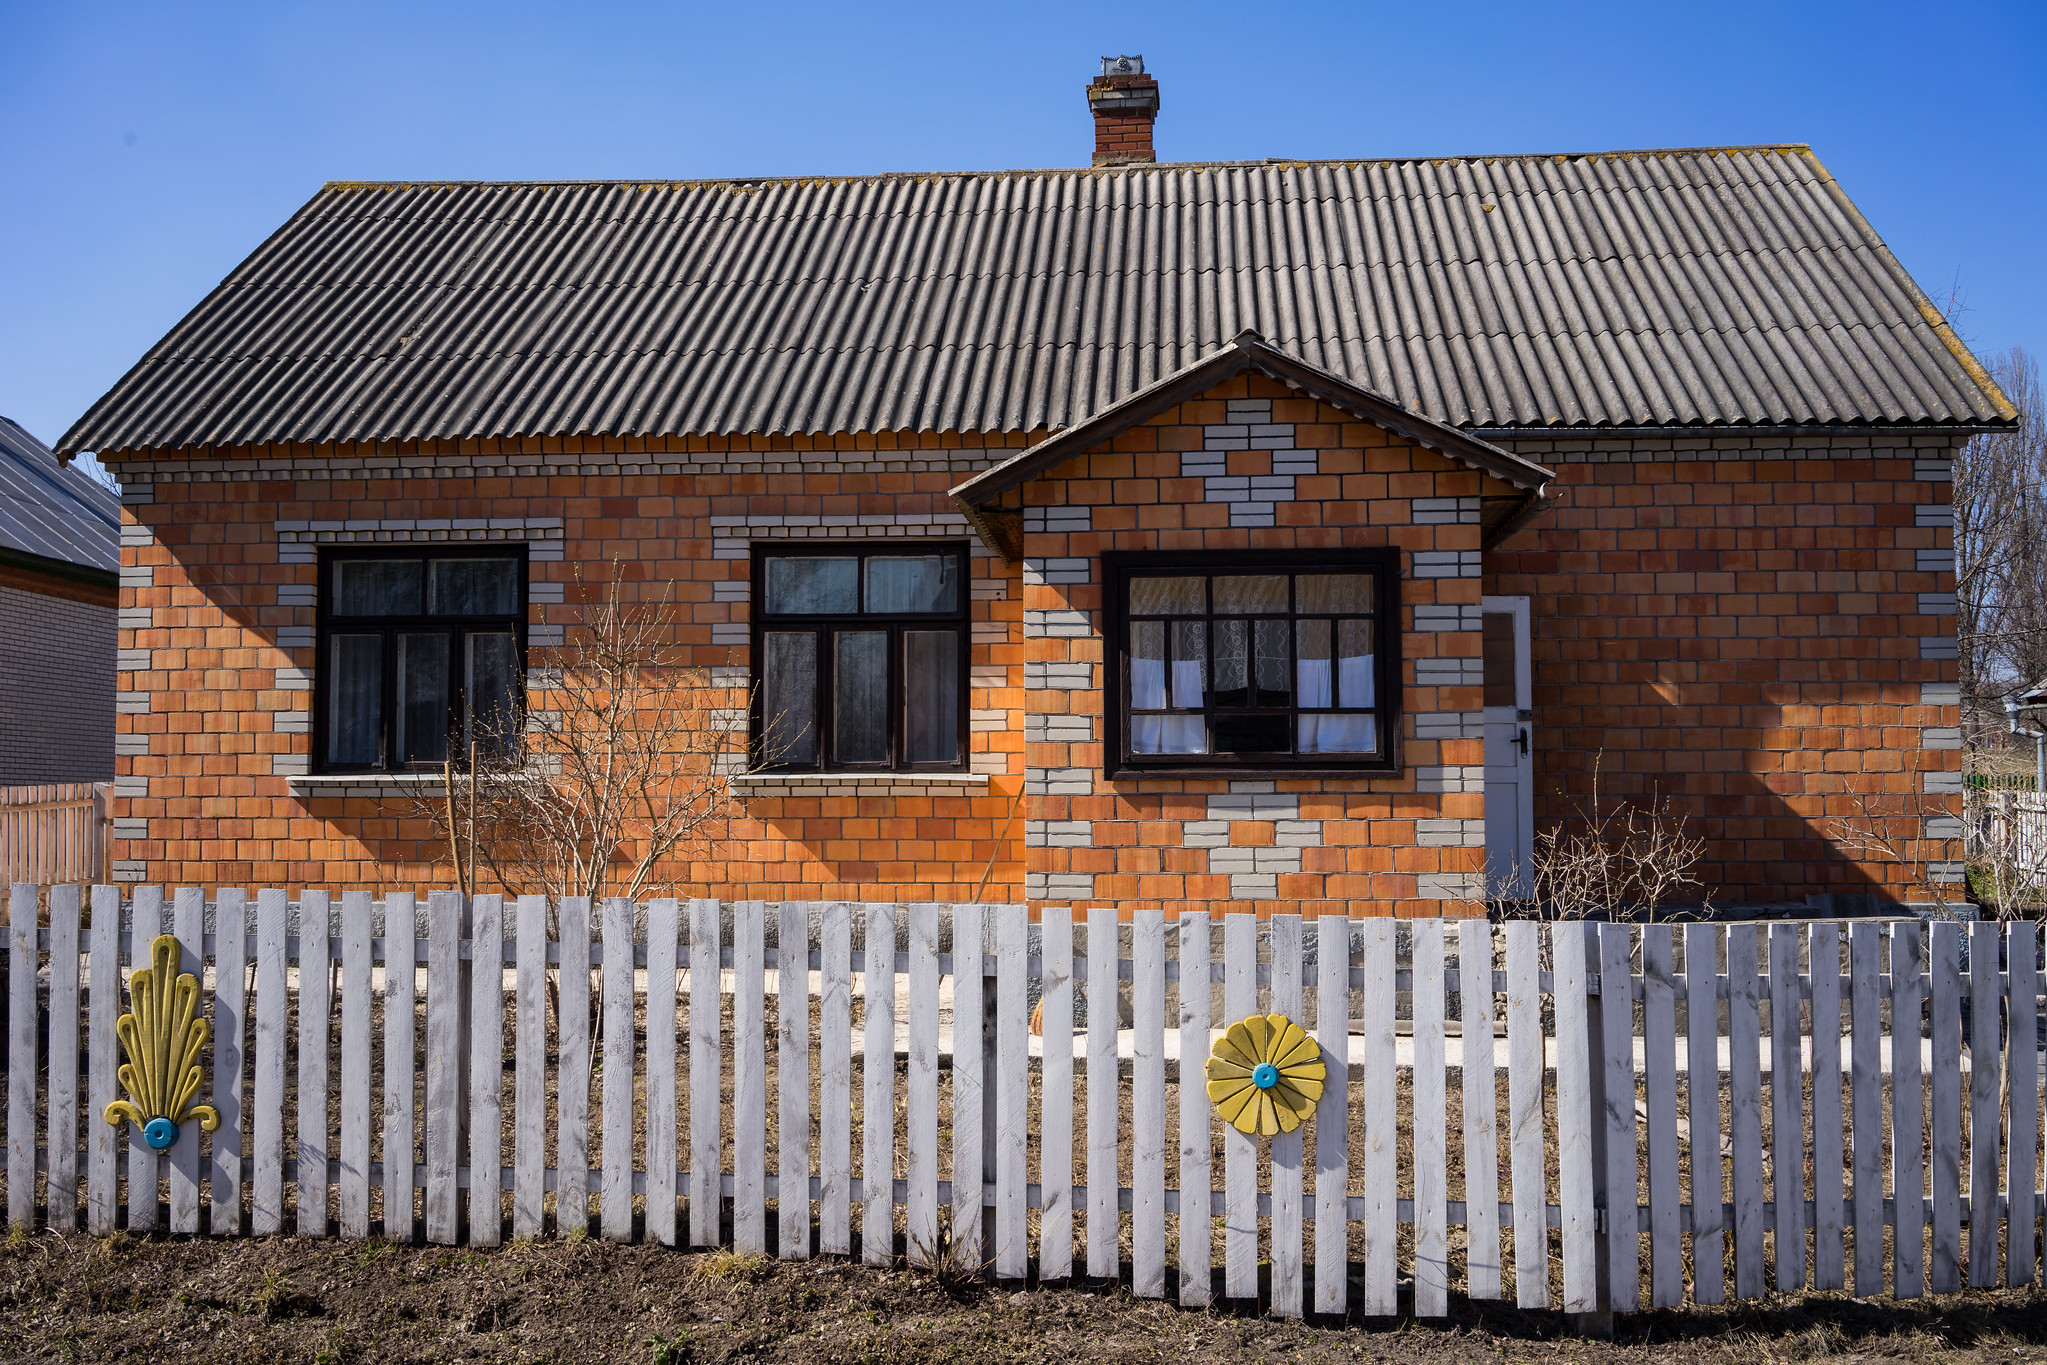 Рівненська область. Фото: Наталка Дяченко